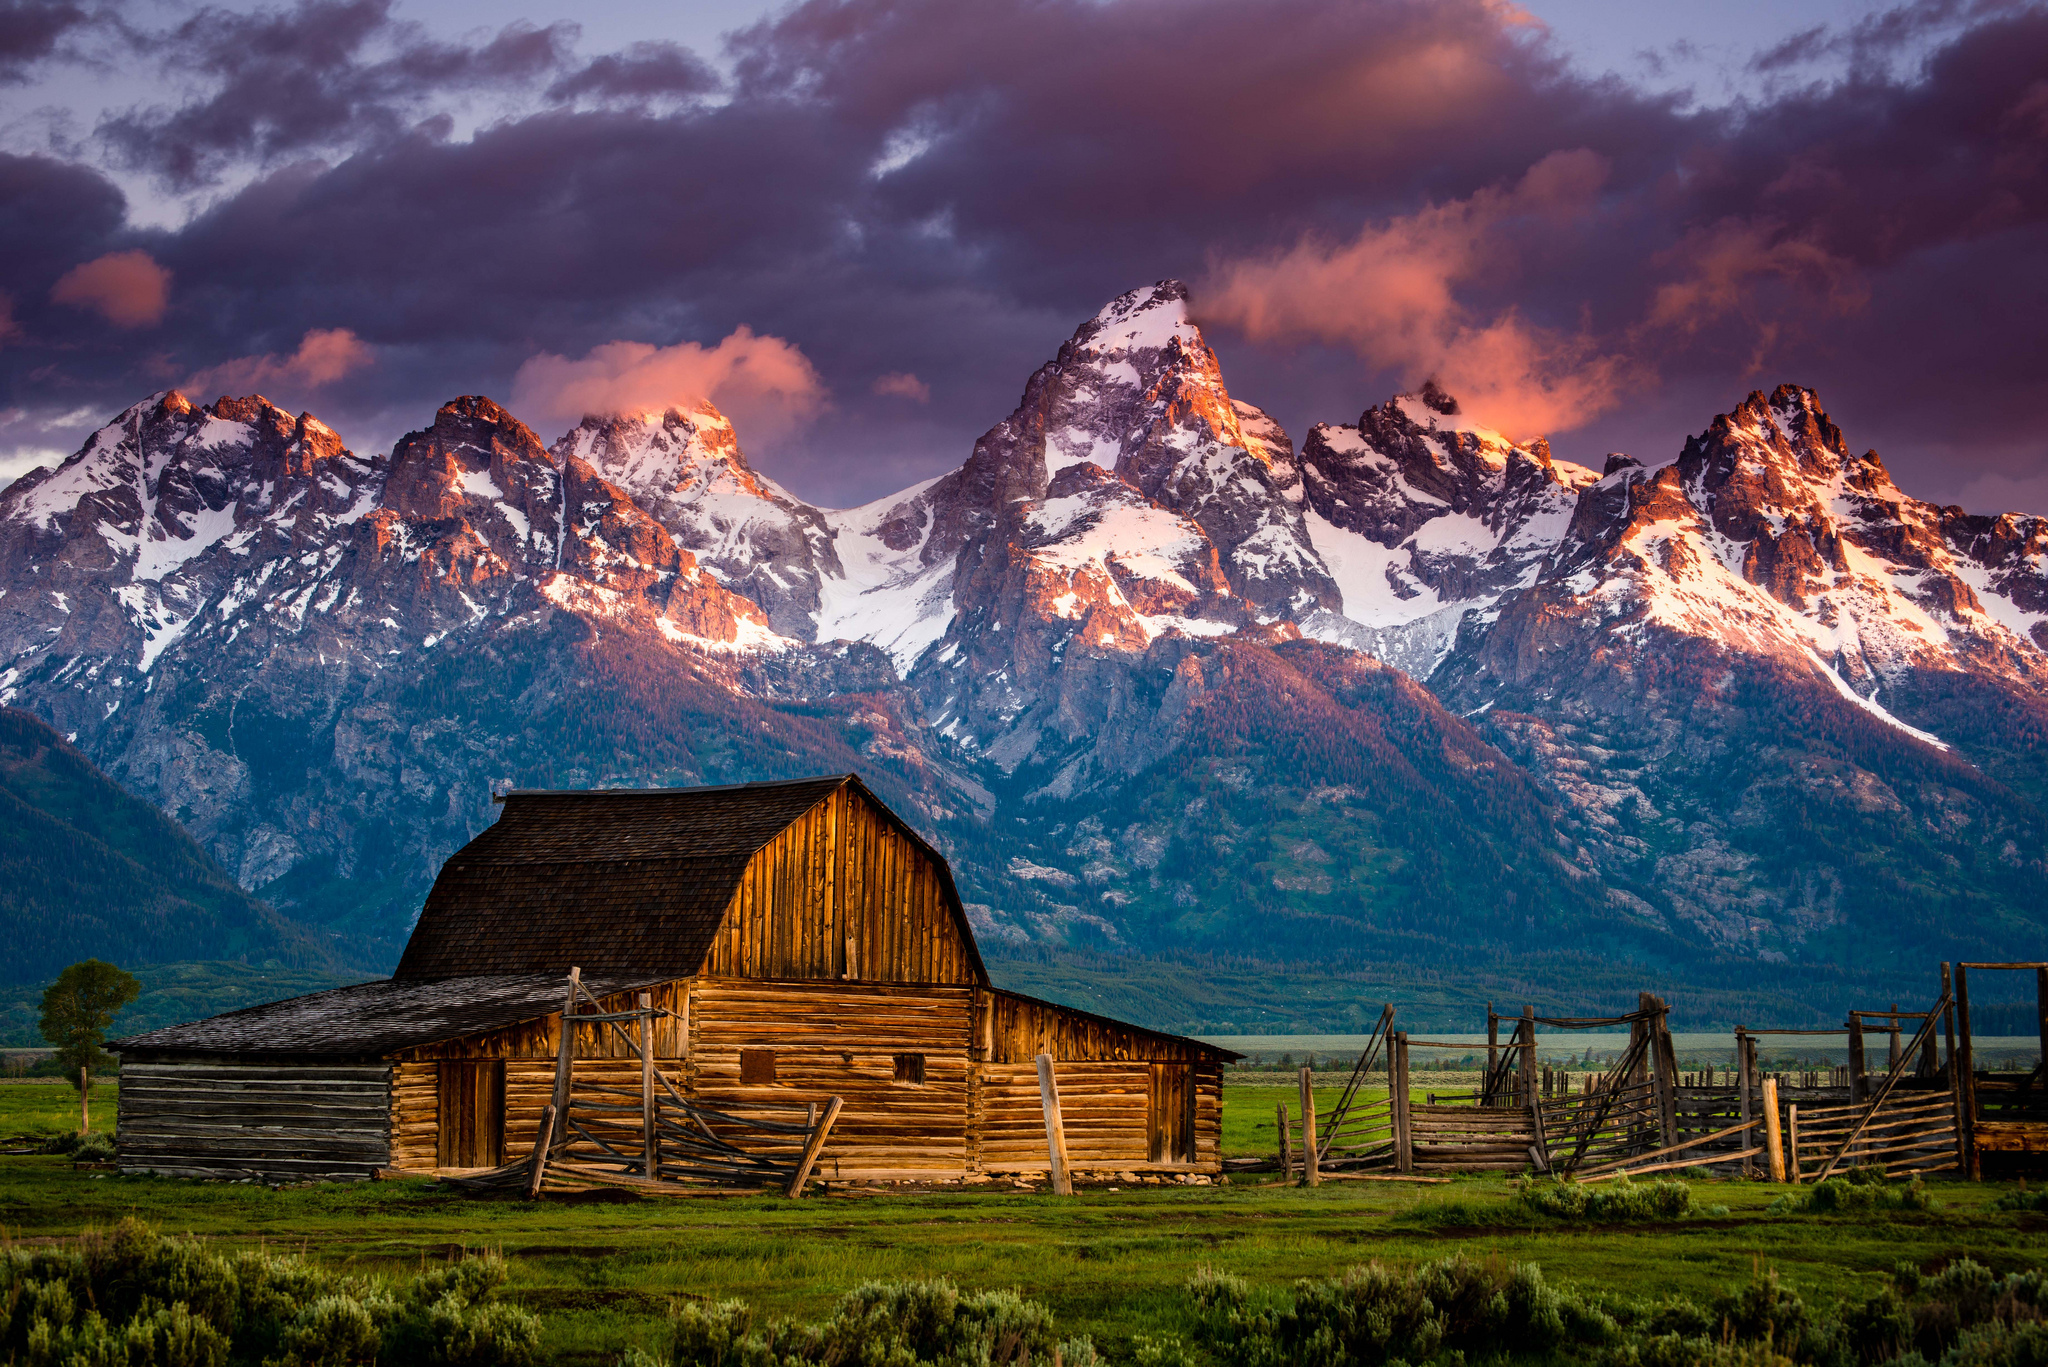 farm barn rustic sunset sunrise mood mountain wallpaper background 2048x1367